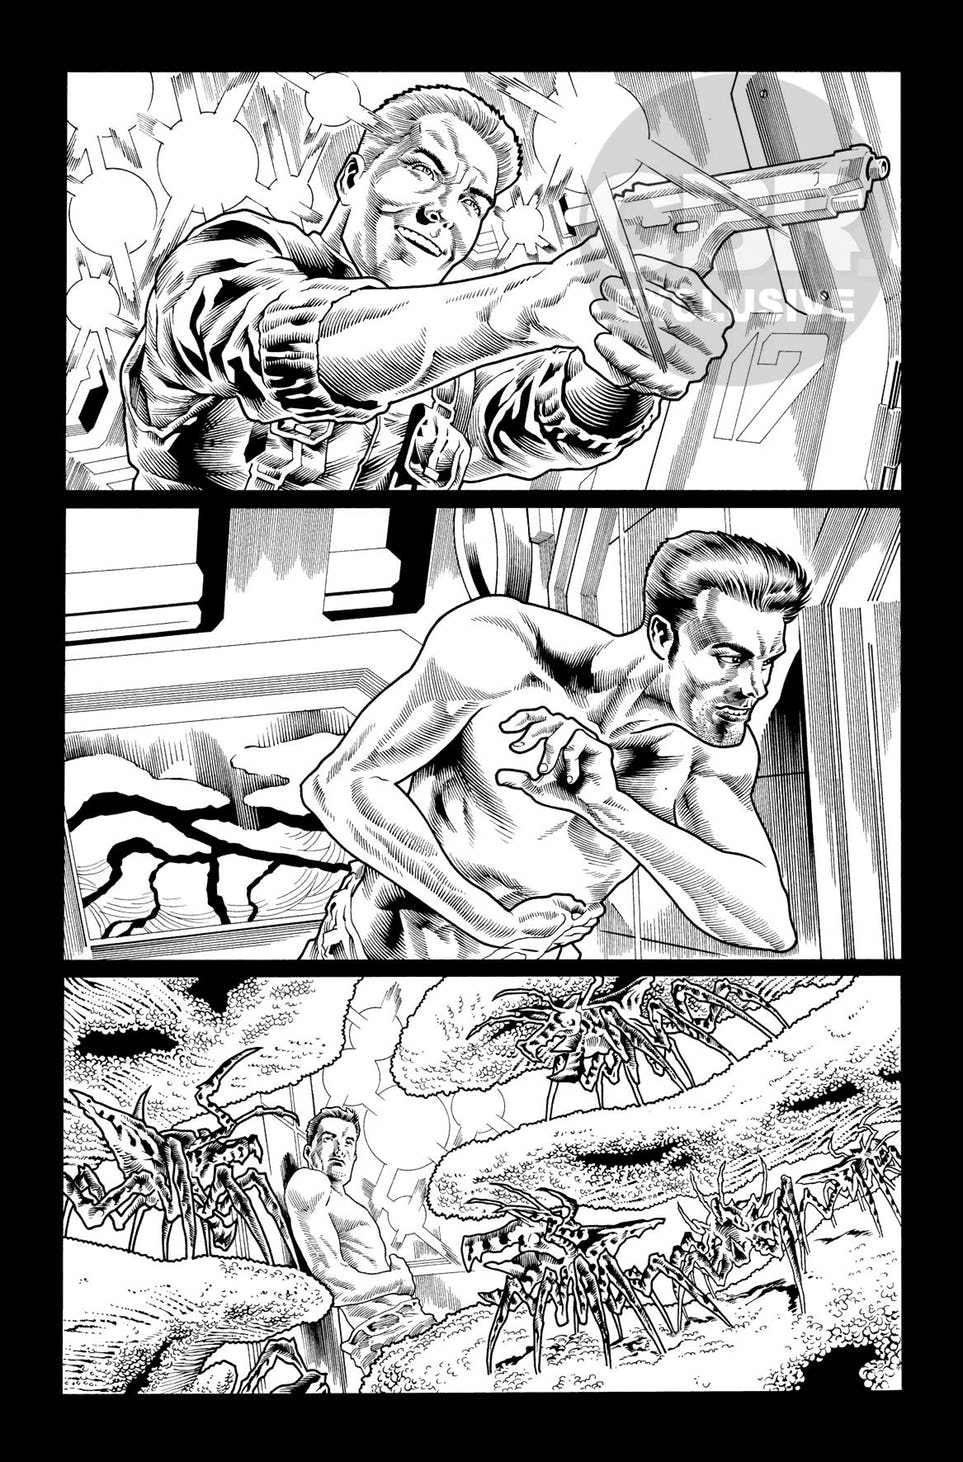 Immortal Hulk #17, anteprima 01